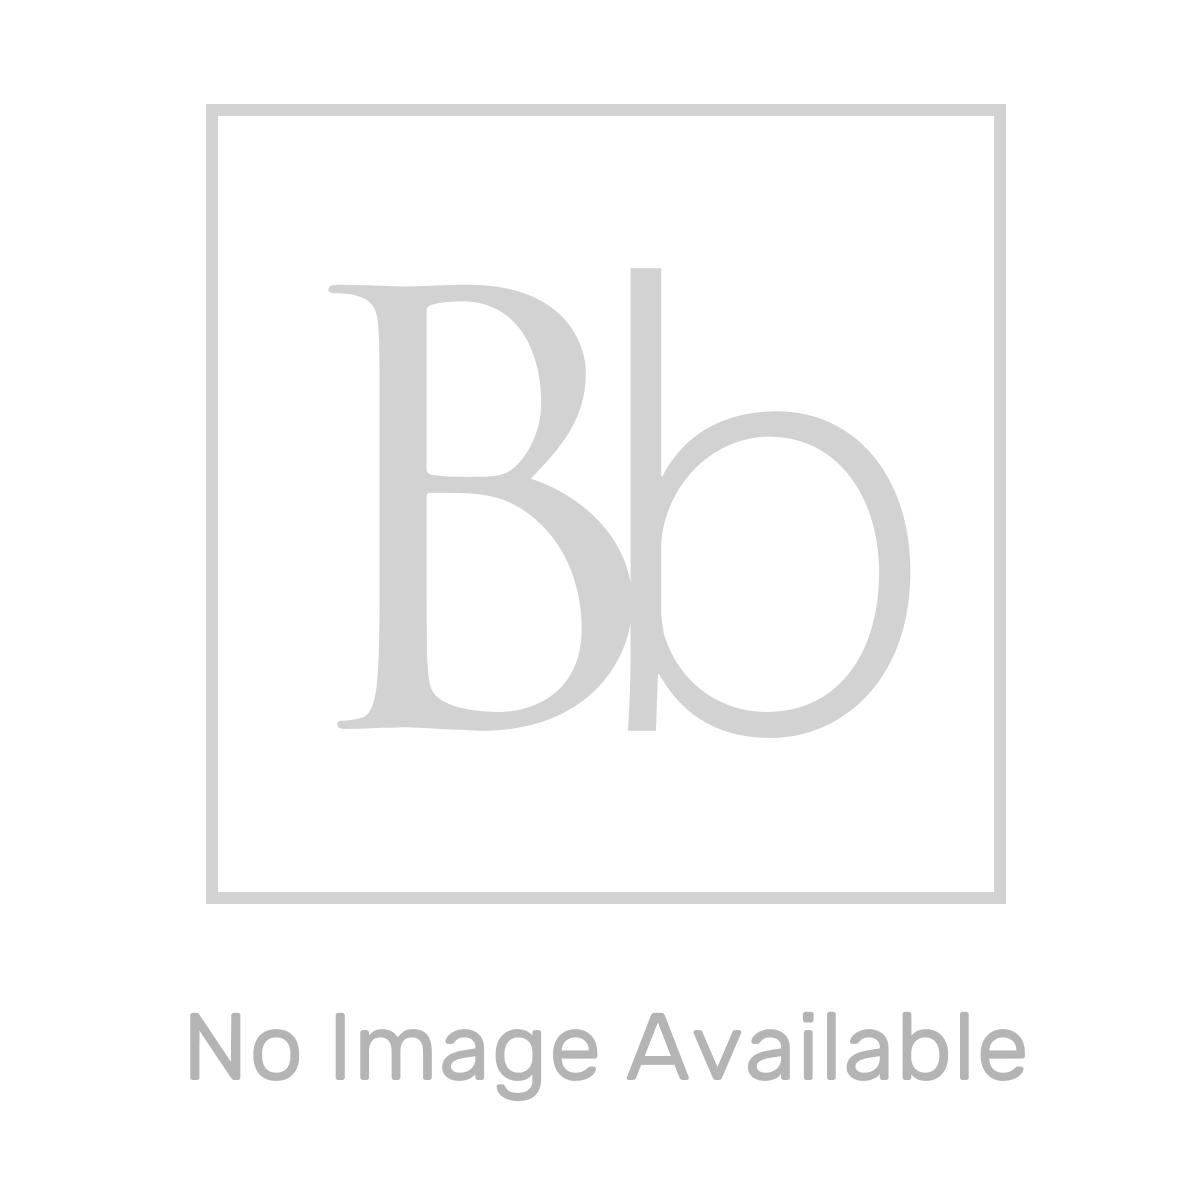 Sensio Bronte LED Mirror with Demister Pad SE30576C0.1